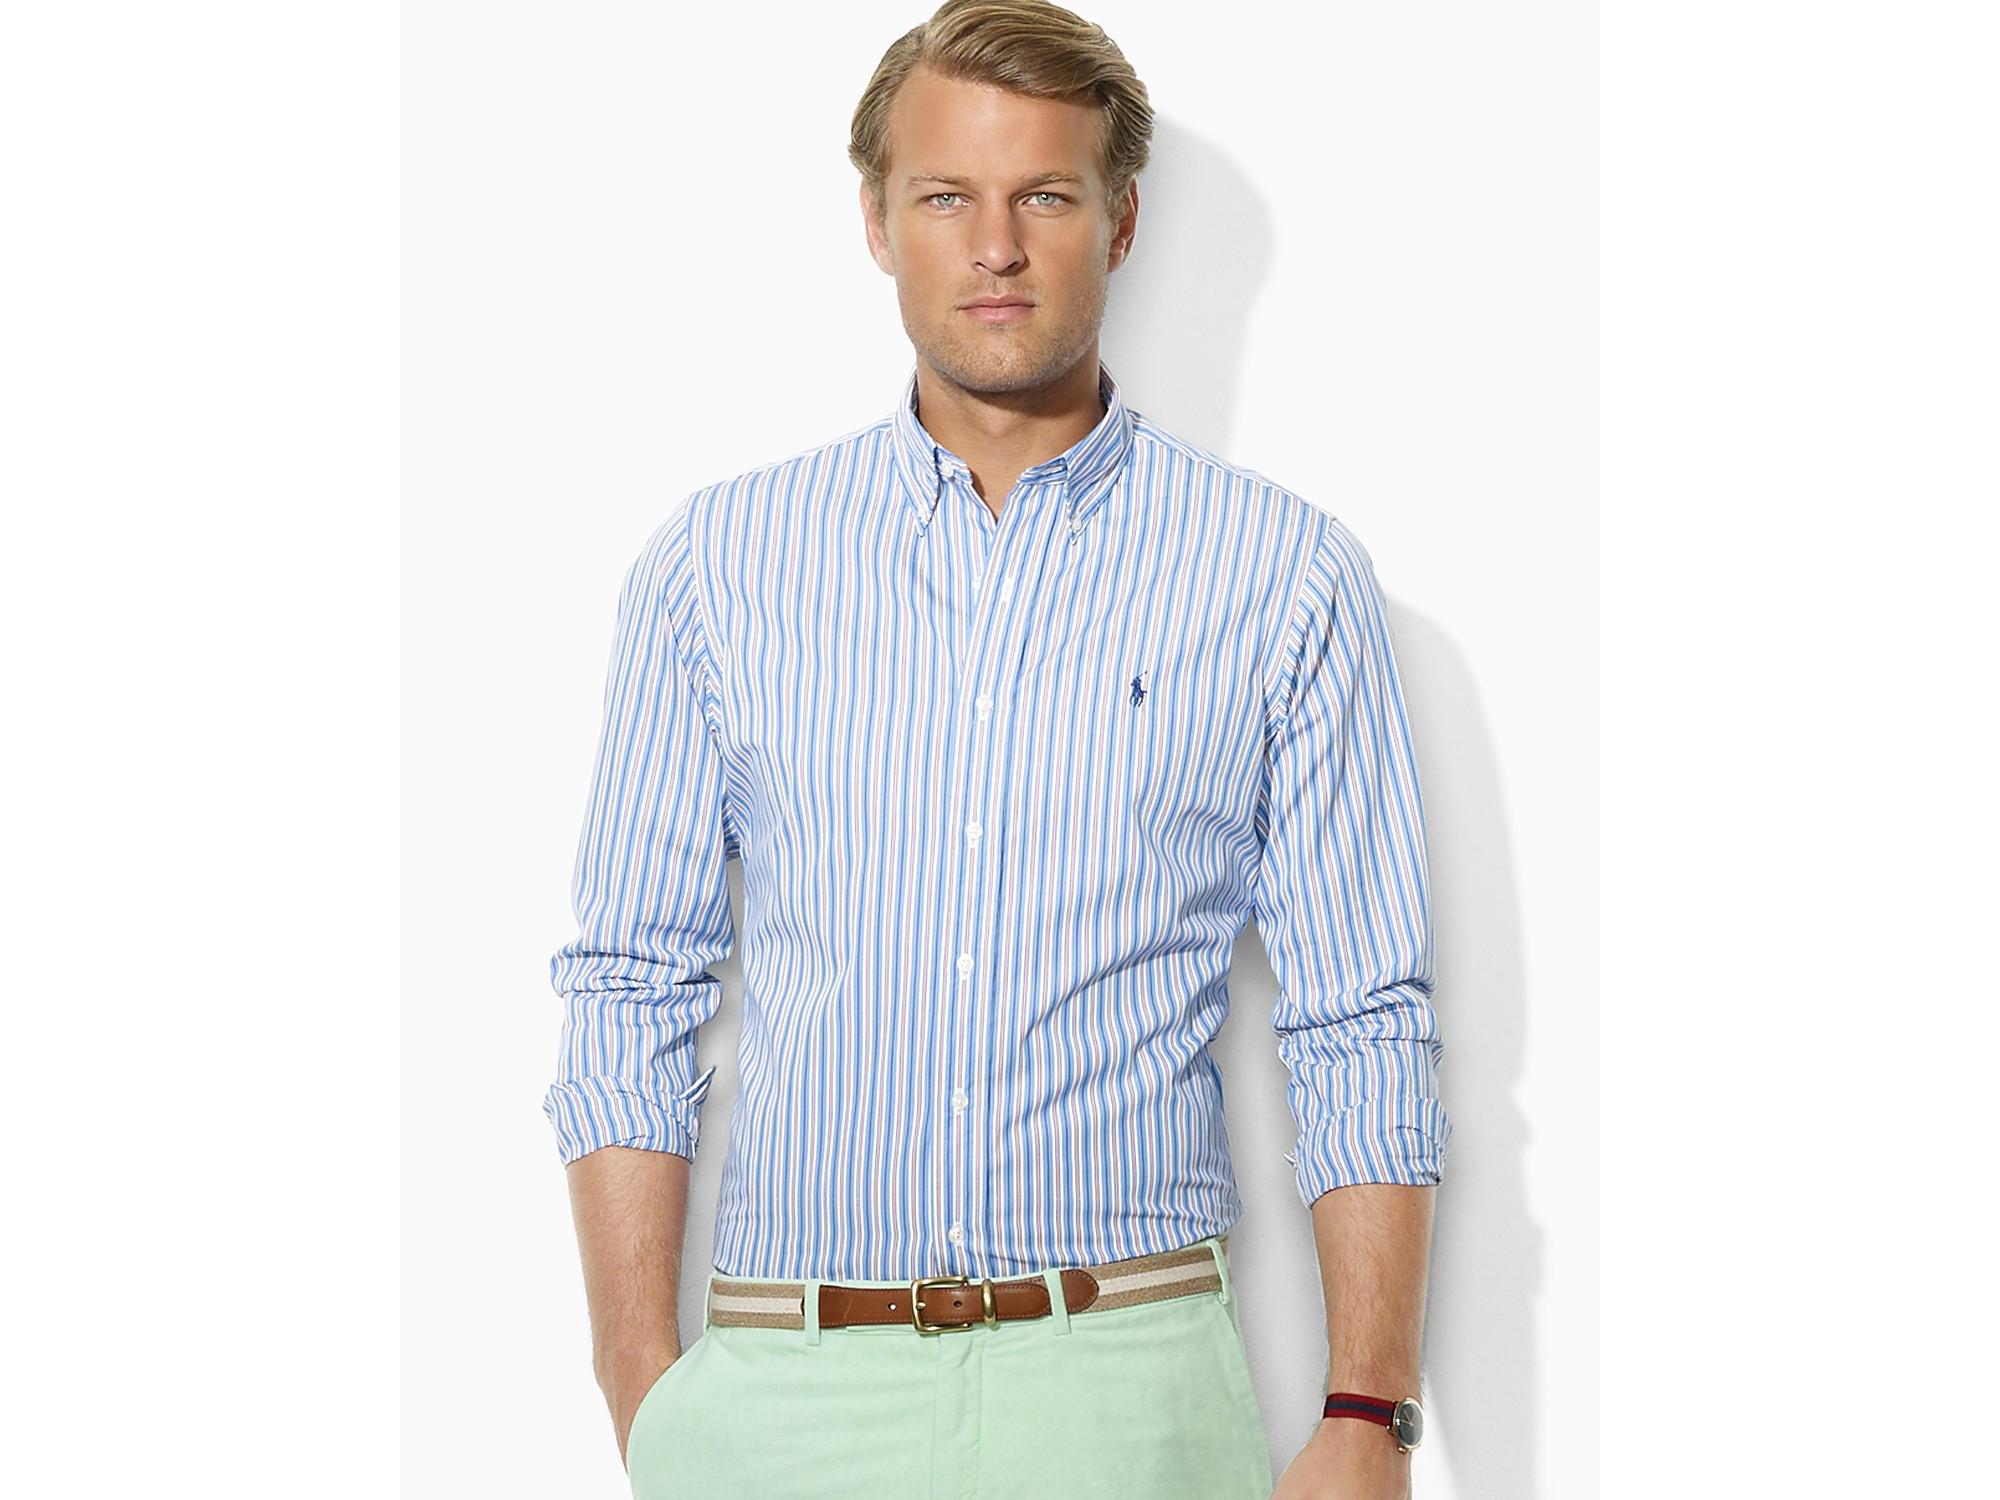 4e56c635ad5 Polo Ralph Lauren Customfit Stripe Poplin Shirt in Blue for Men - Lyst